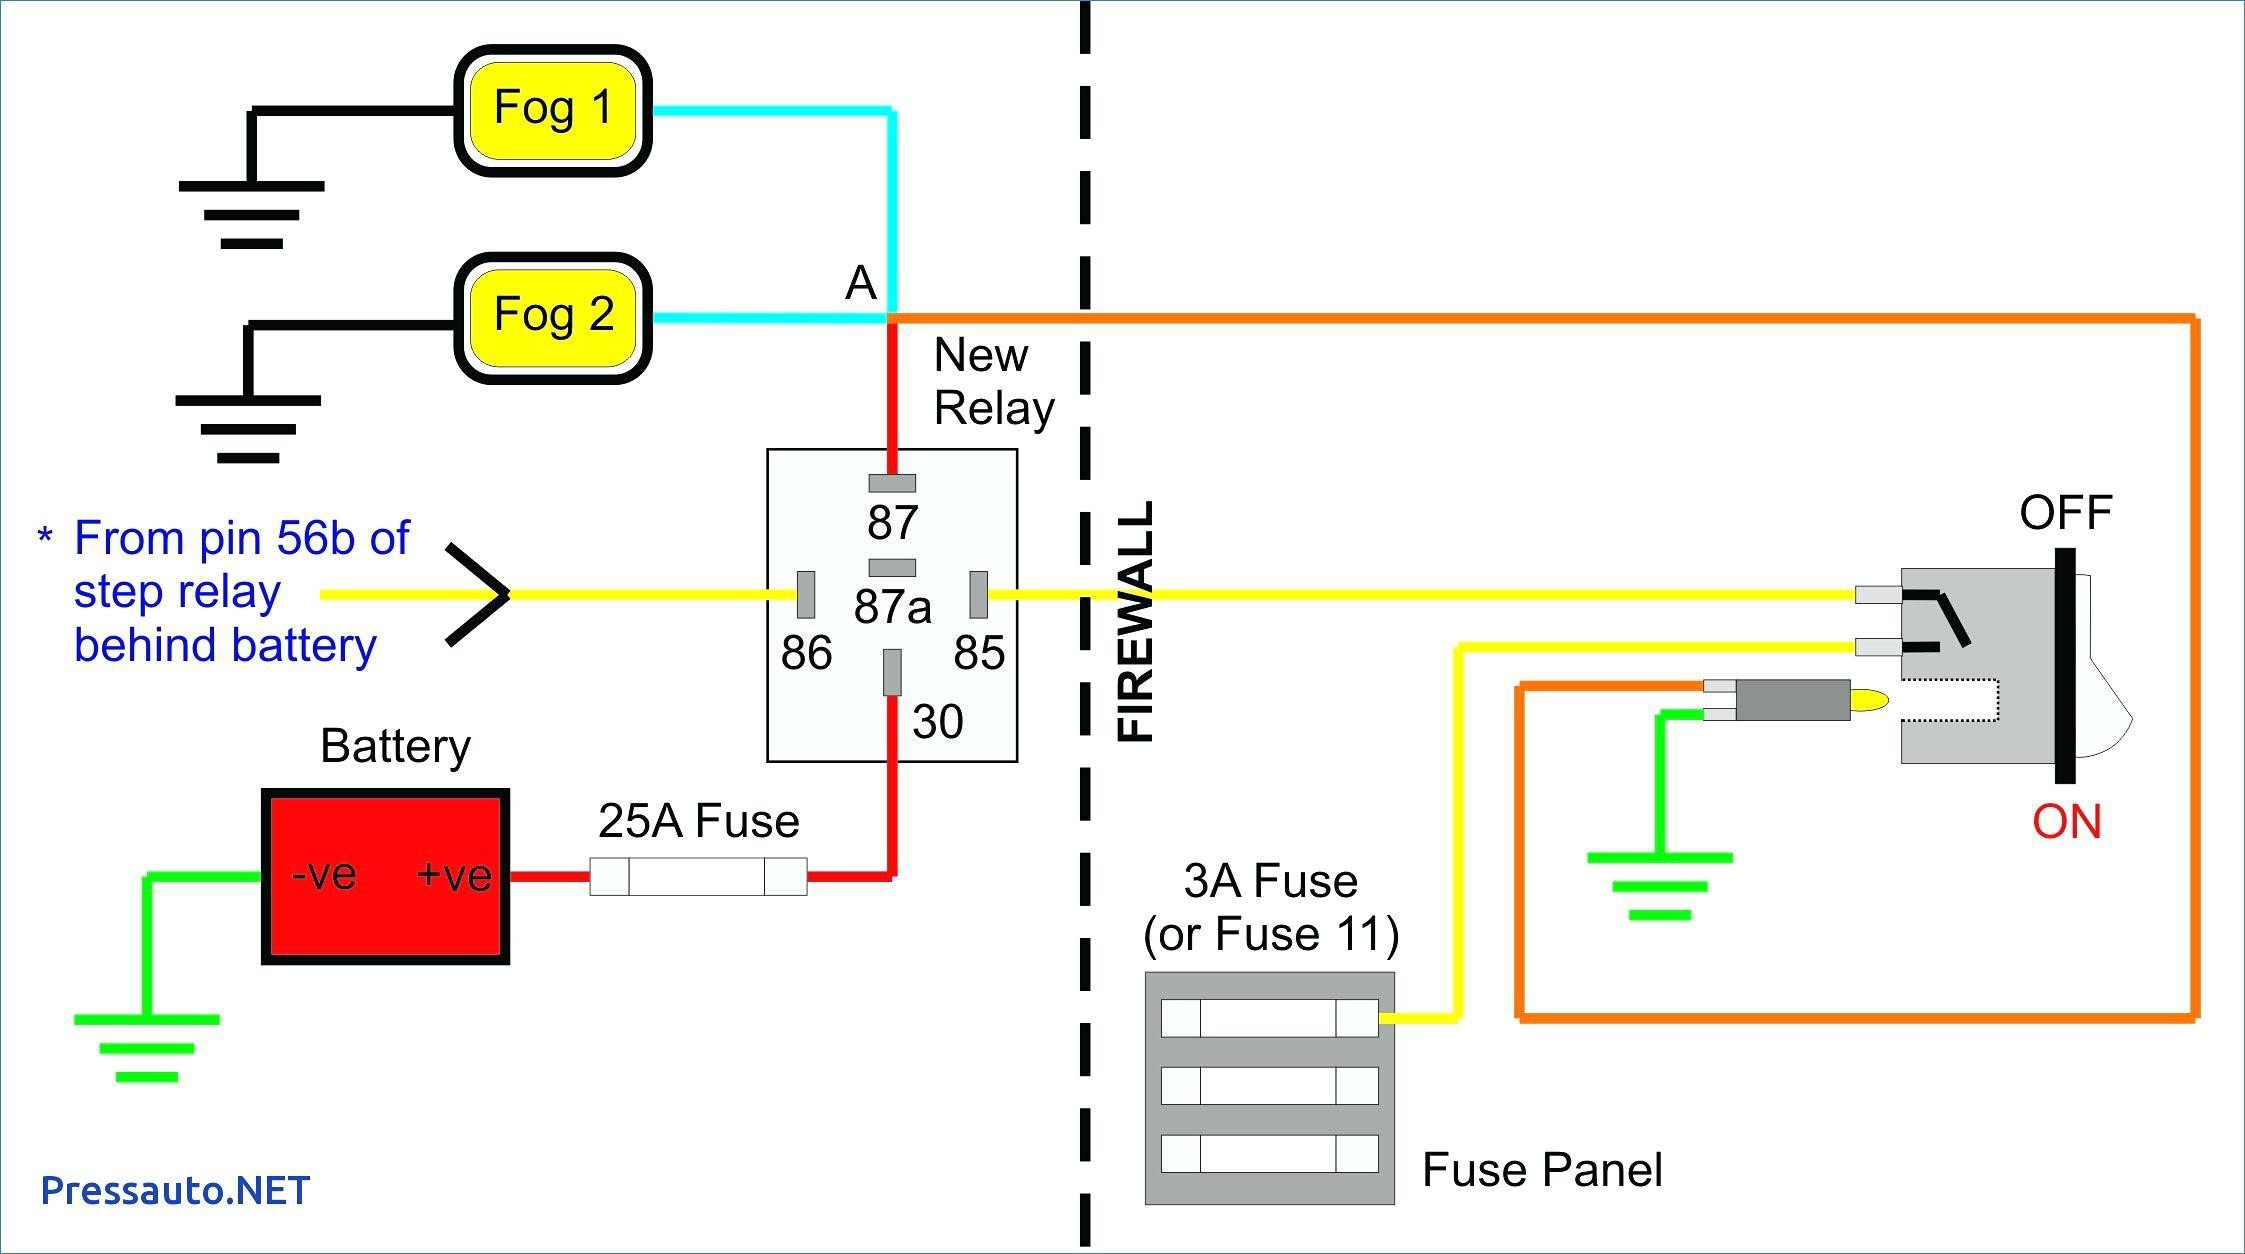 Fog Light Relay Diagram Fresh Wiring Diagram for A Relay for Fog Lights Valid Fog Light